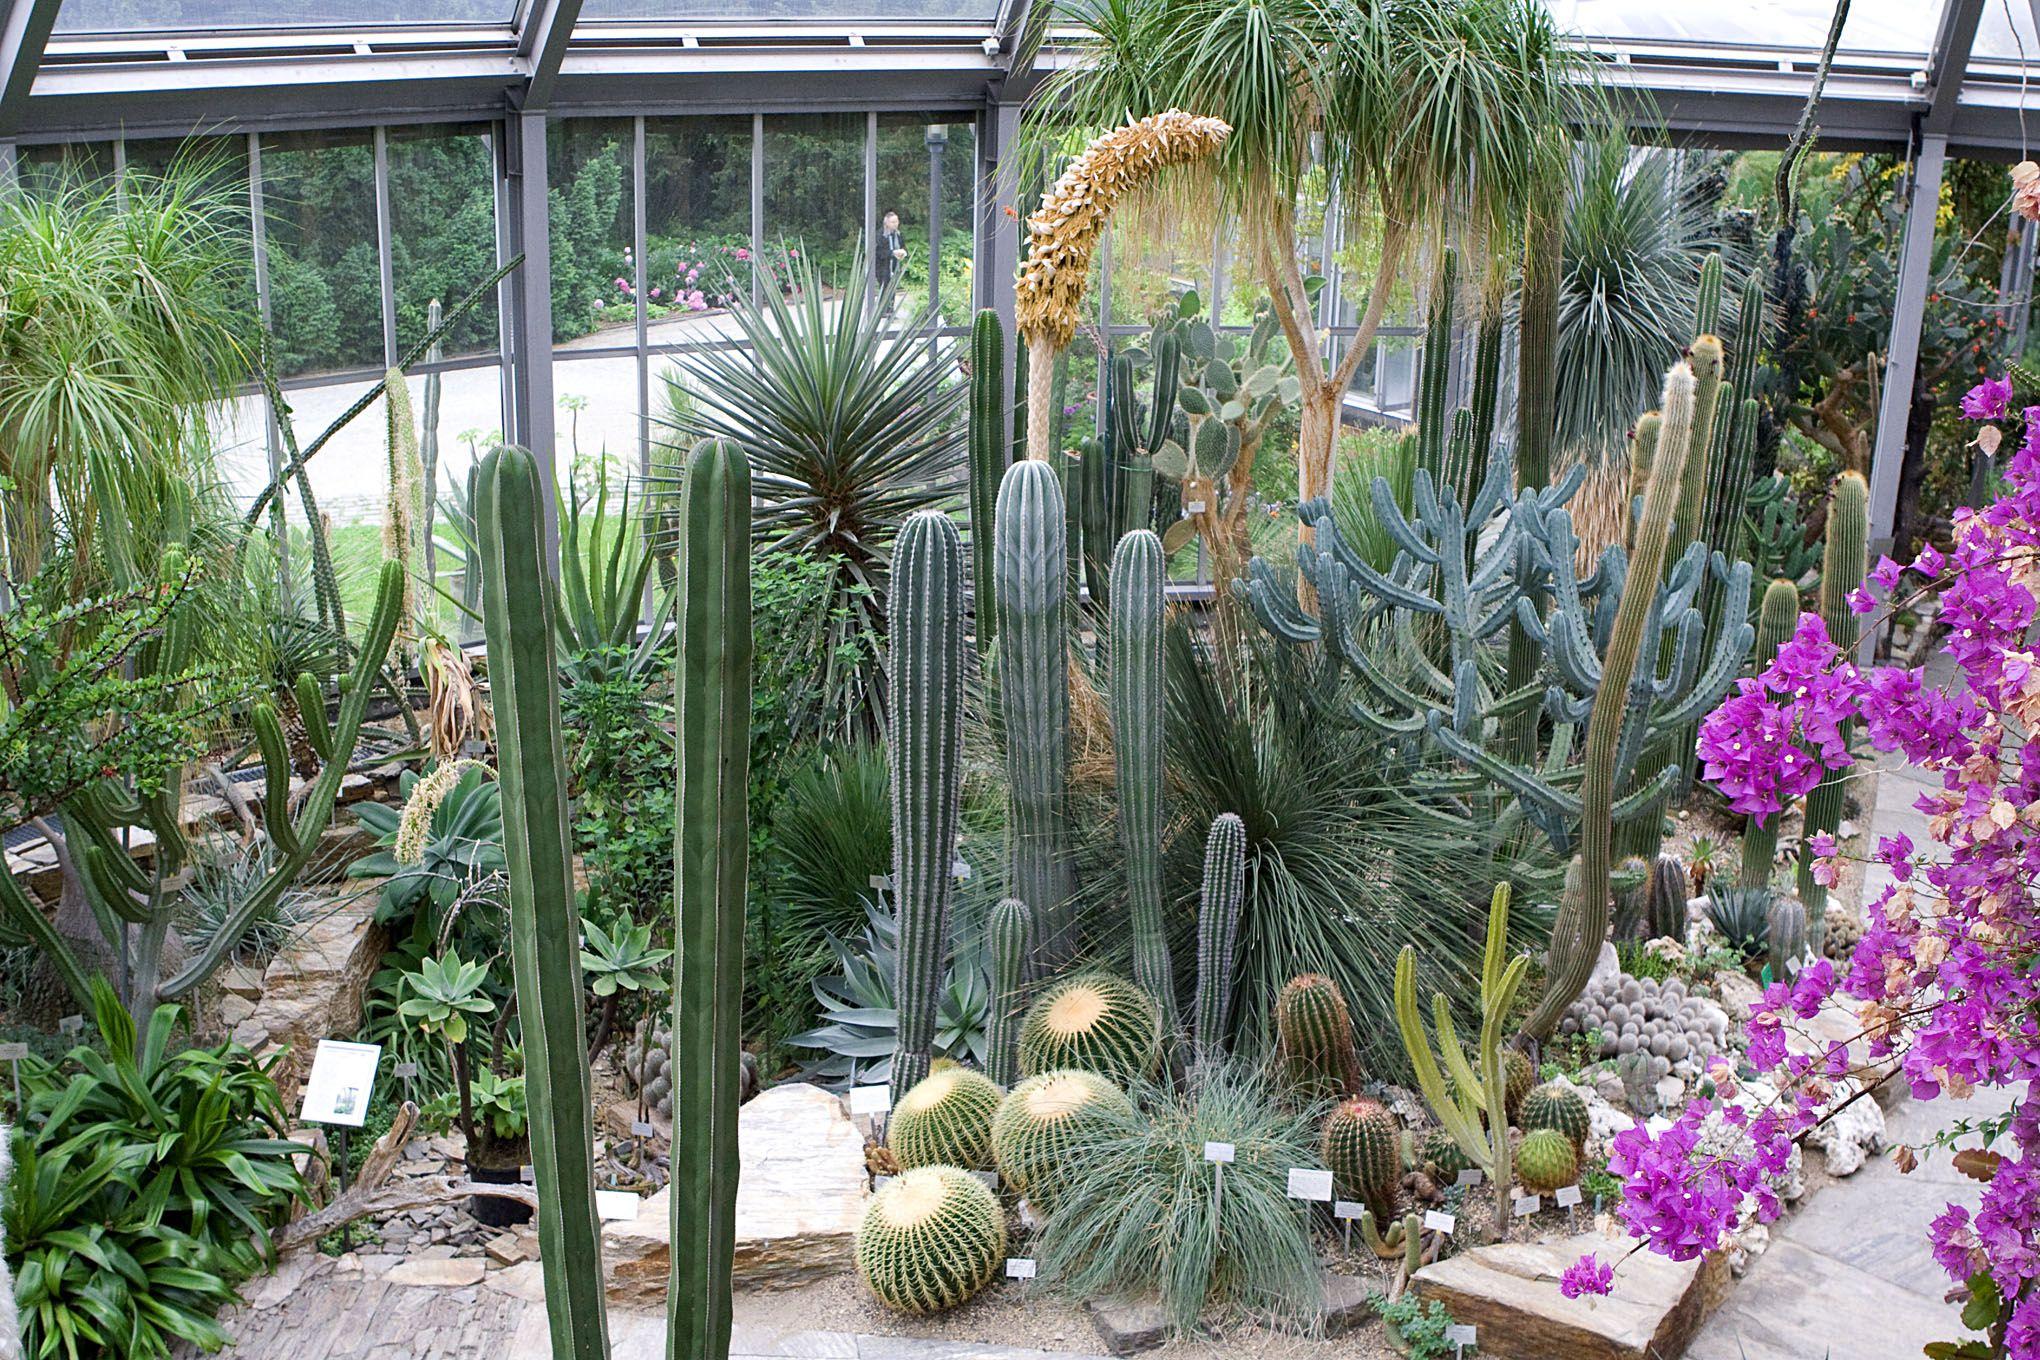 Berlin Dahlem Botanical Garden And Botanical Museum Berlin Germany Botanical Gardens Berlin Plants